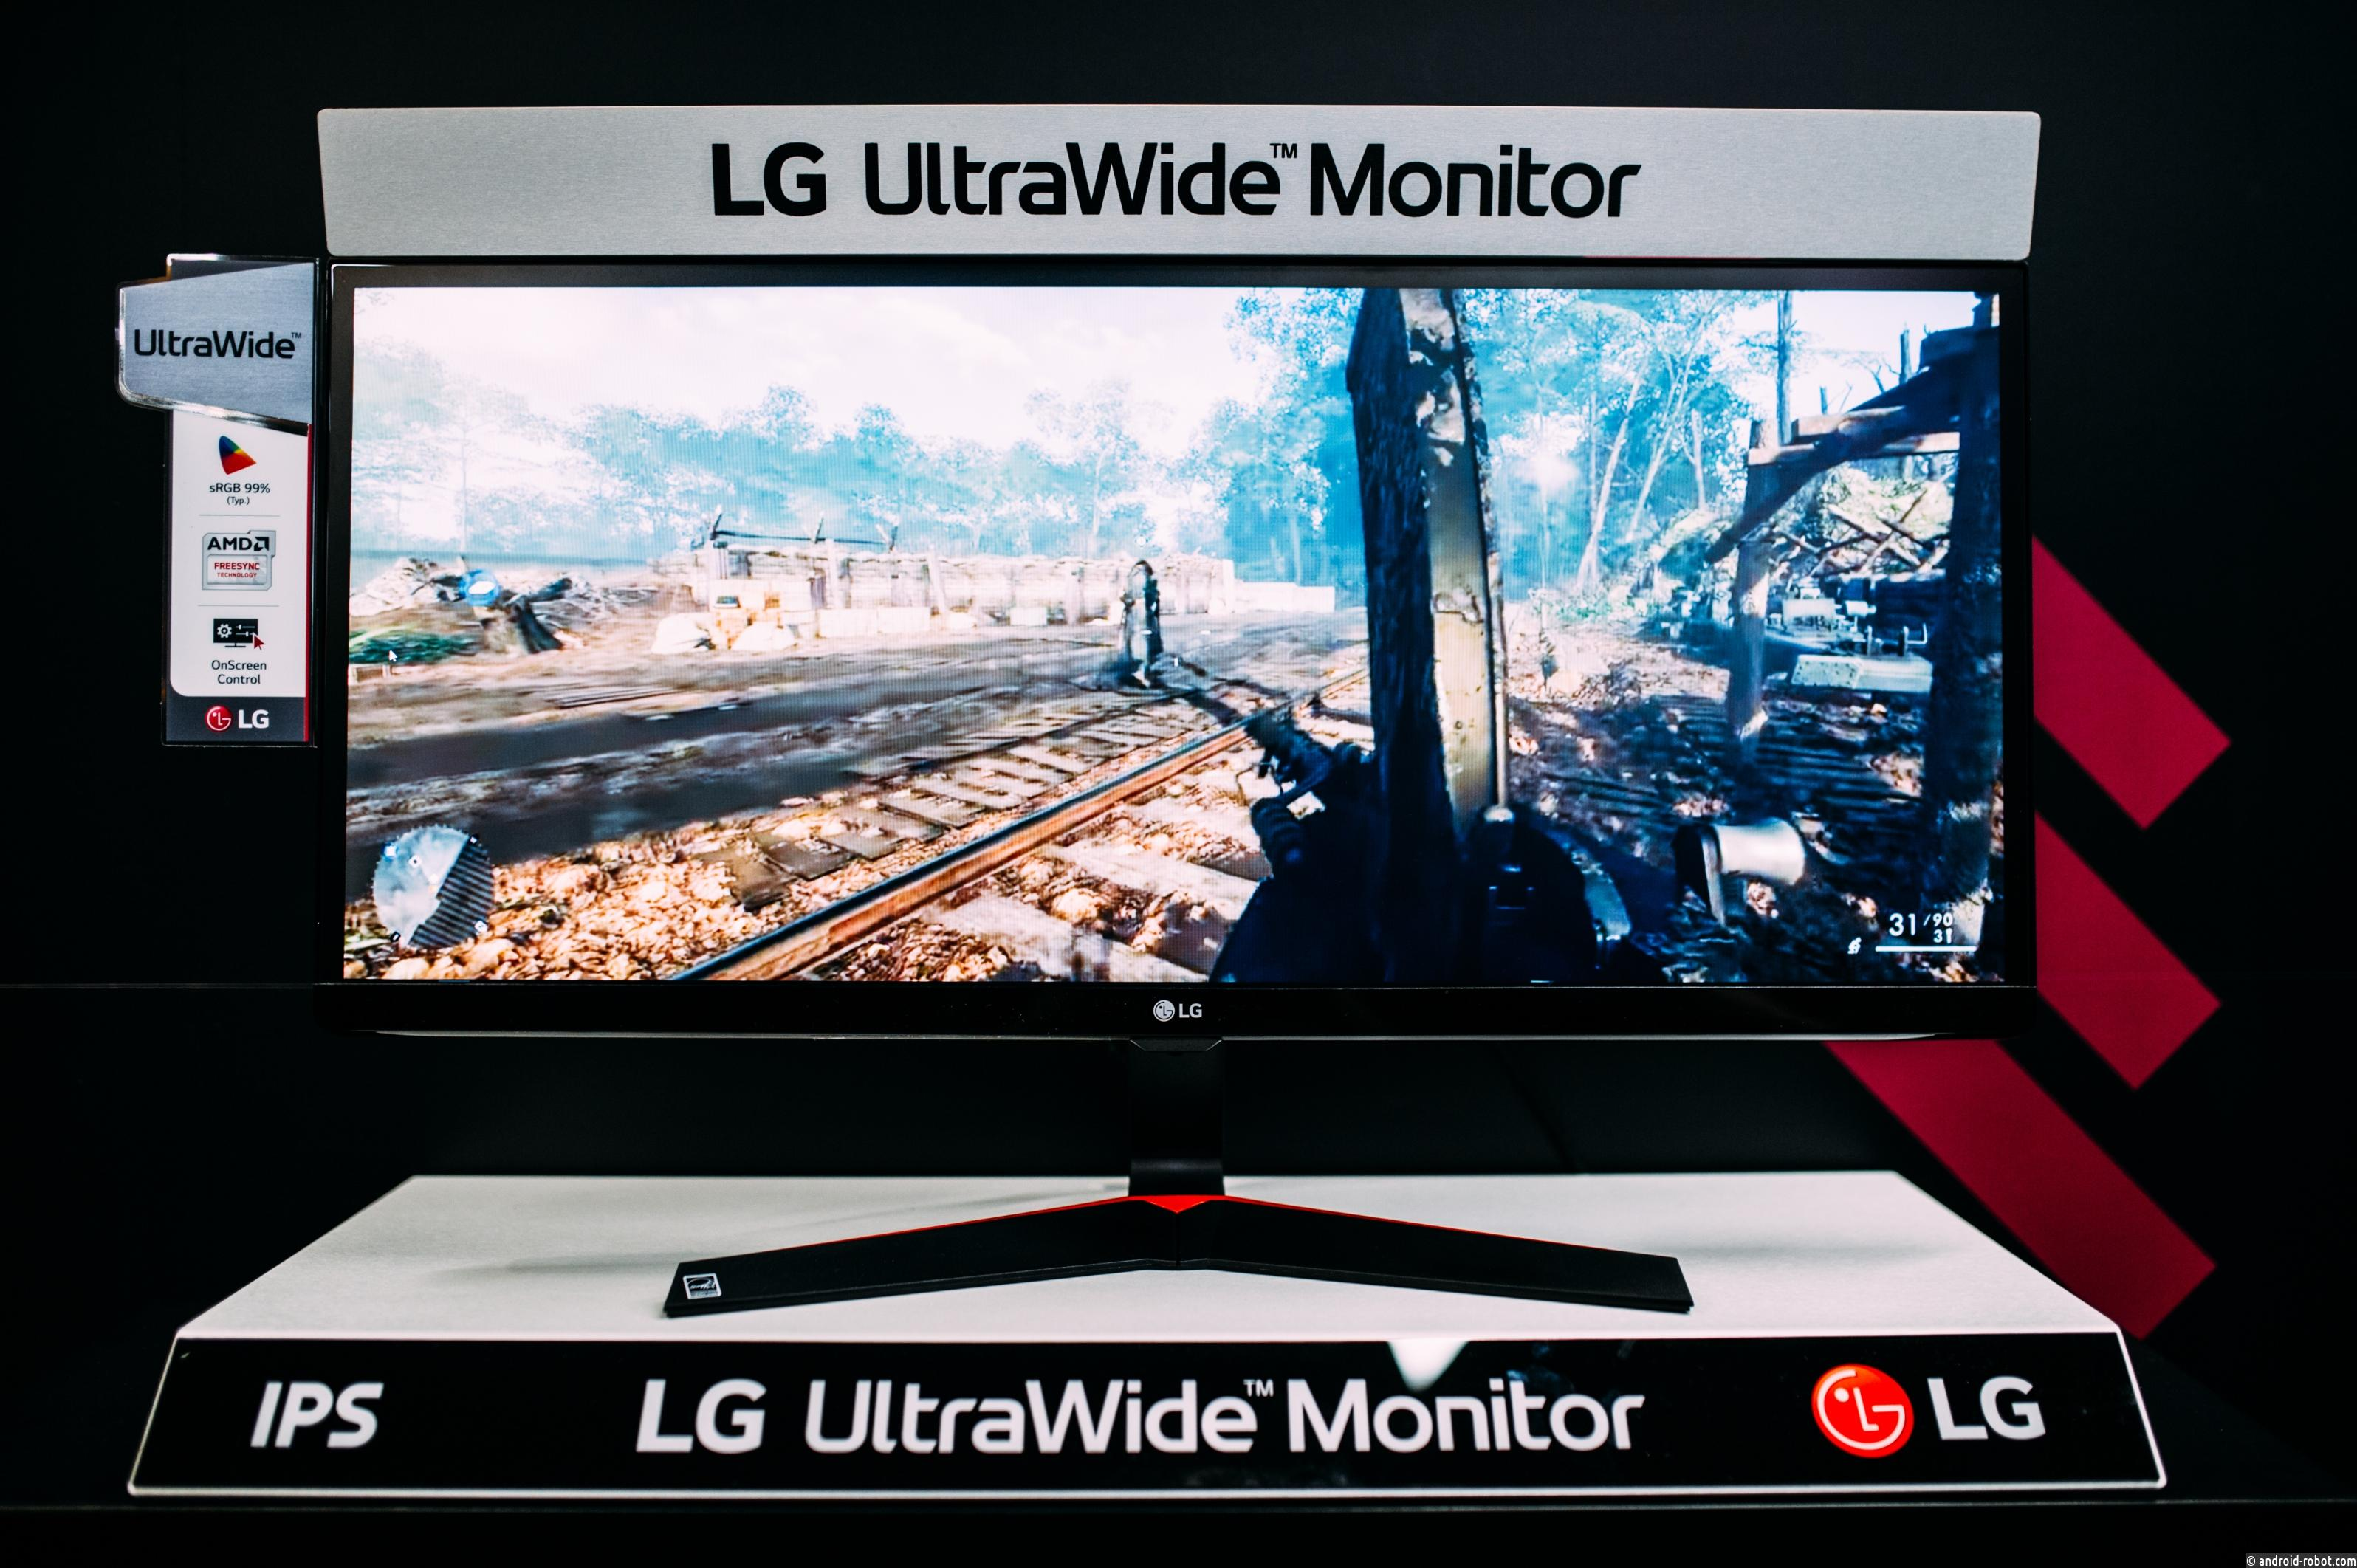 LG представила новую площадку формата Winstrike Corner